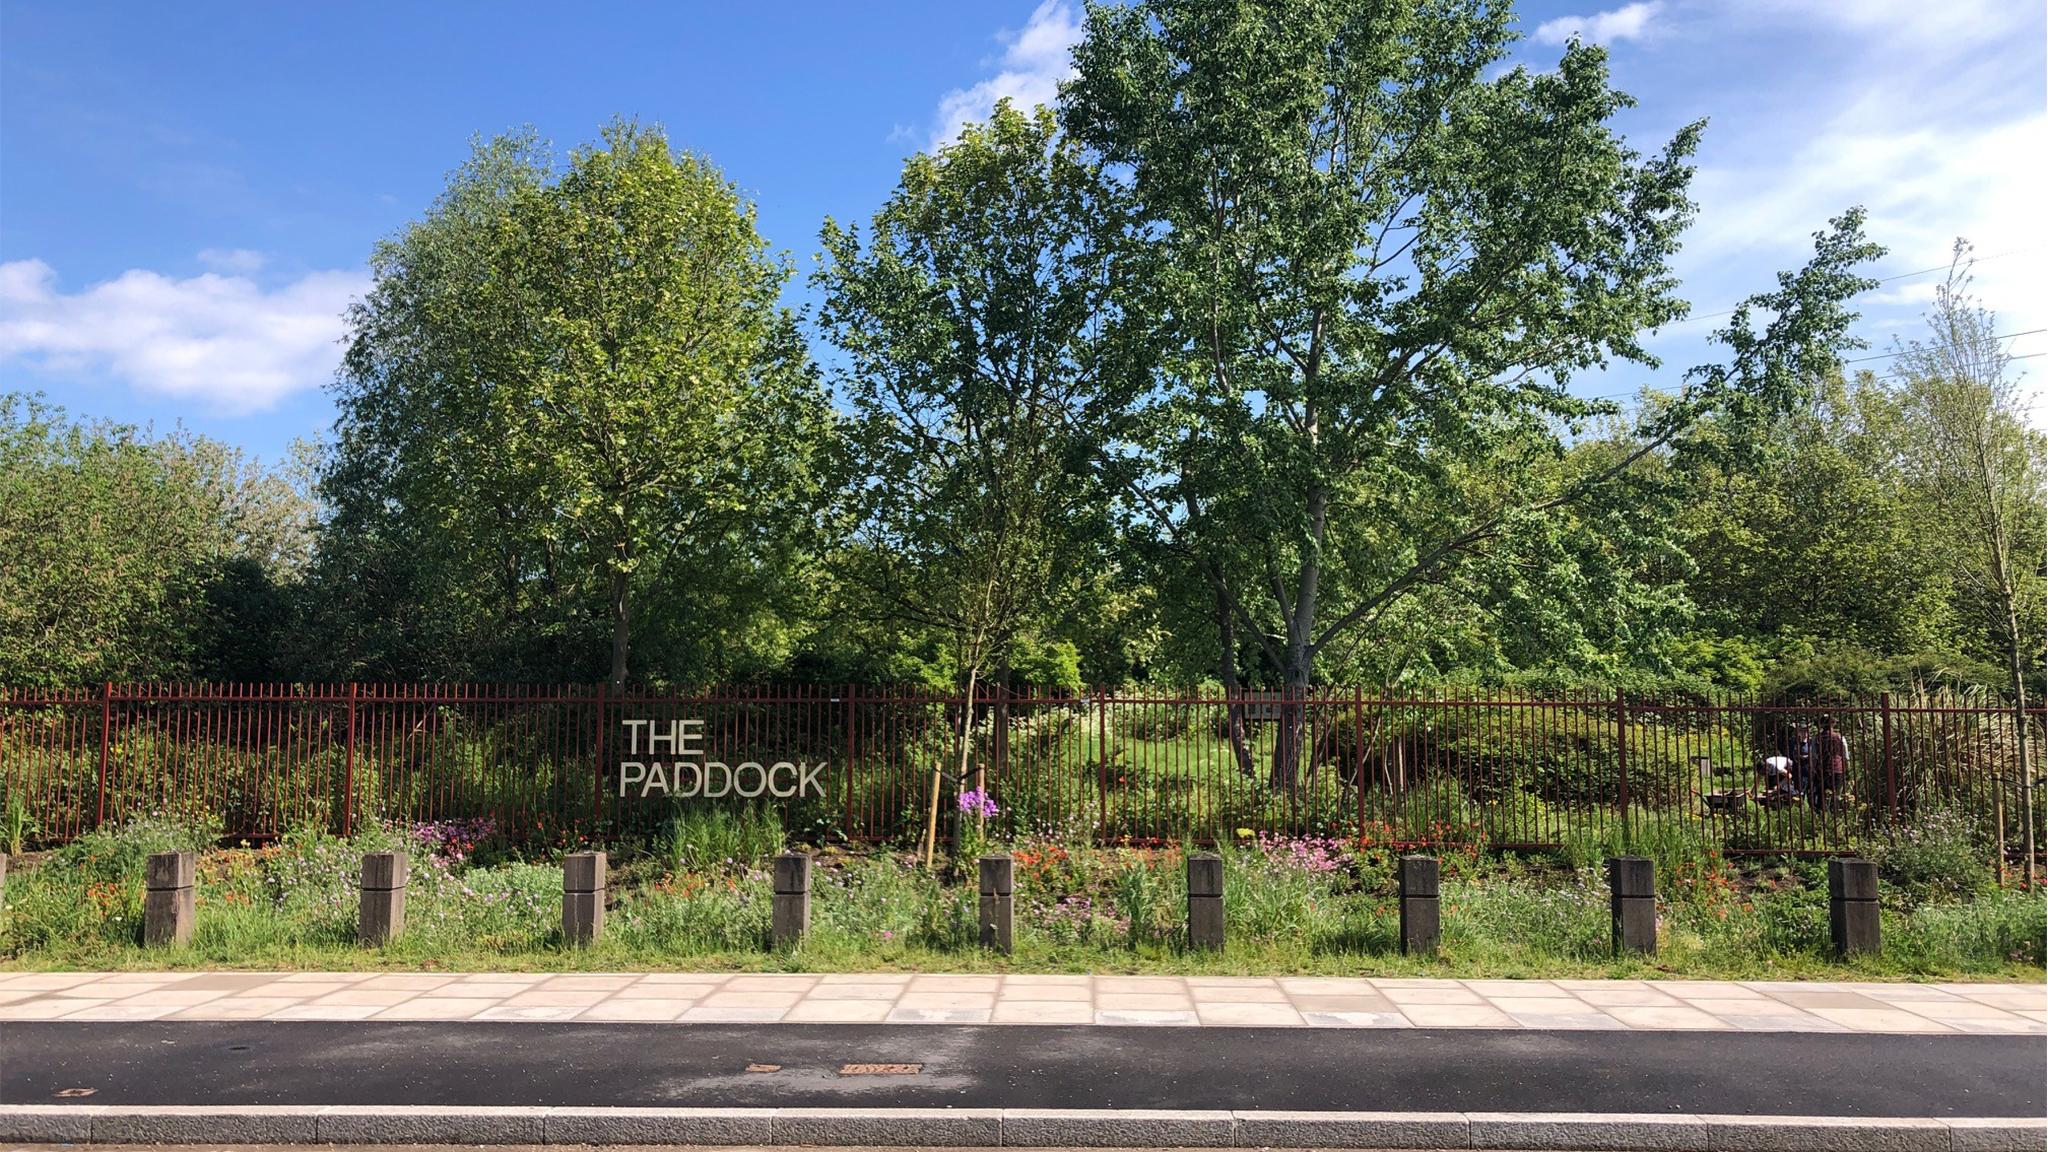 Ferry Lane Public Realm Scheme